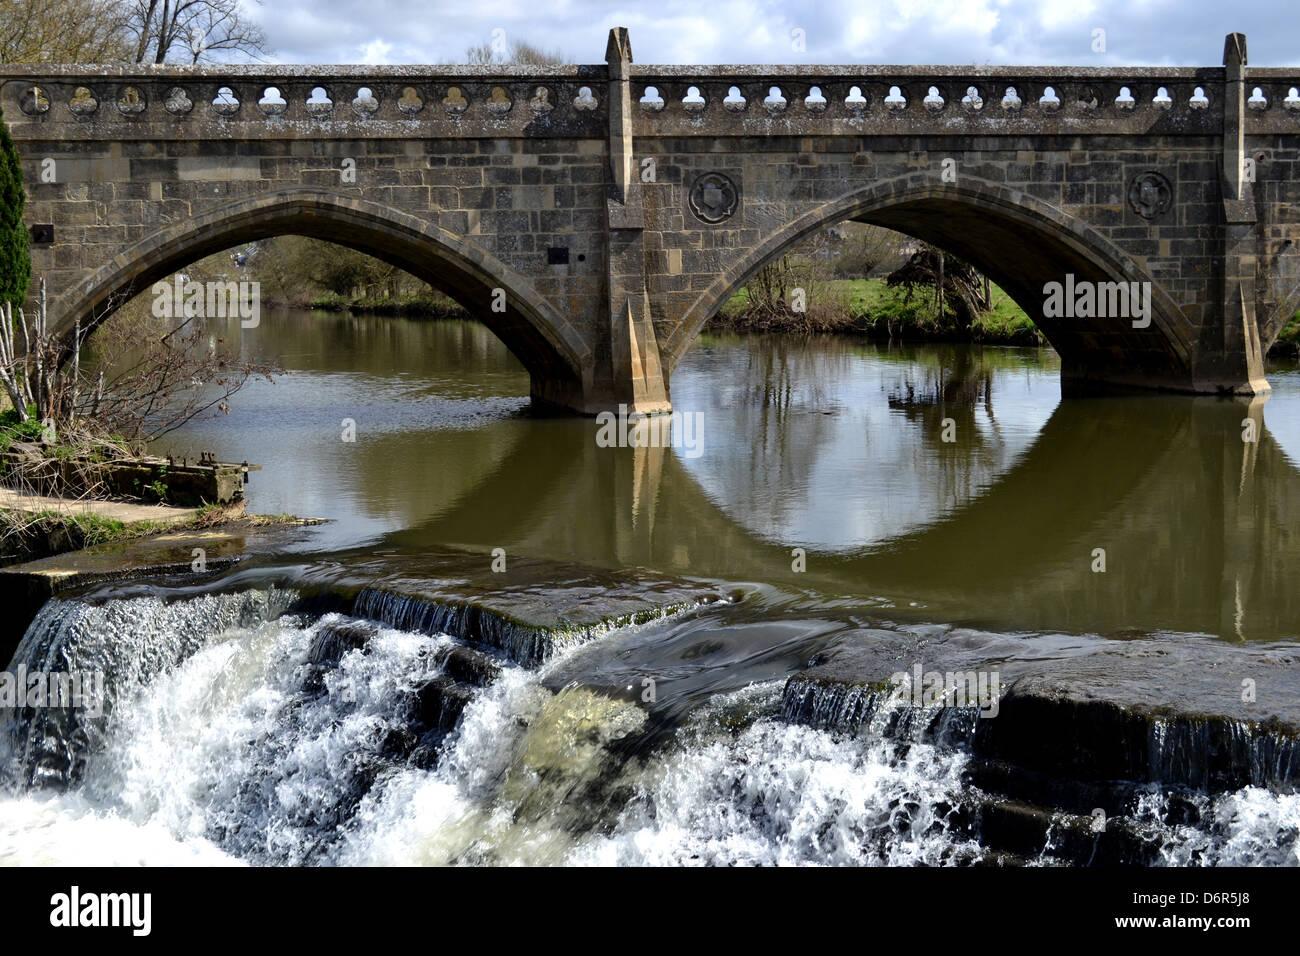 Bathampton Weir and Toll Bridge, also known as Batheaston Toll Bridge and Bathwick Weir. Stock Photo